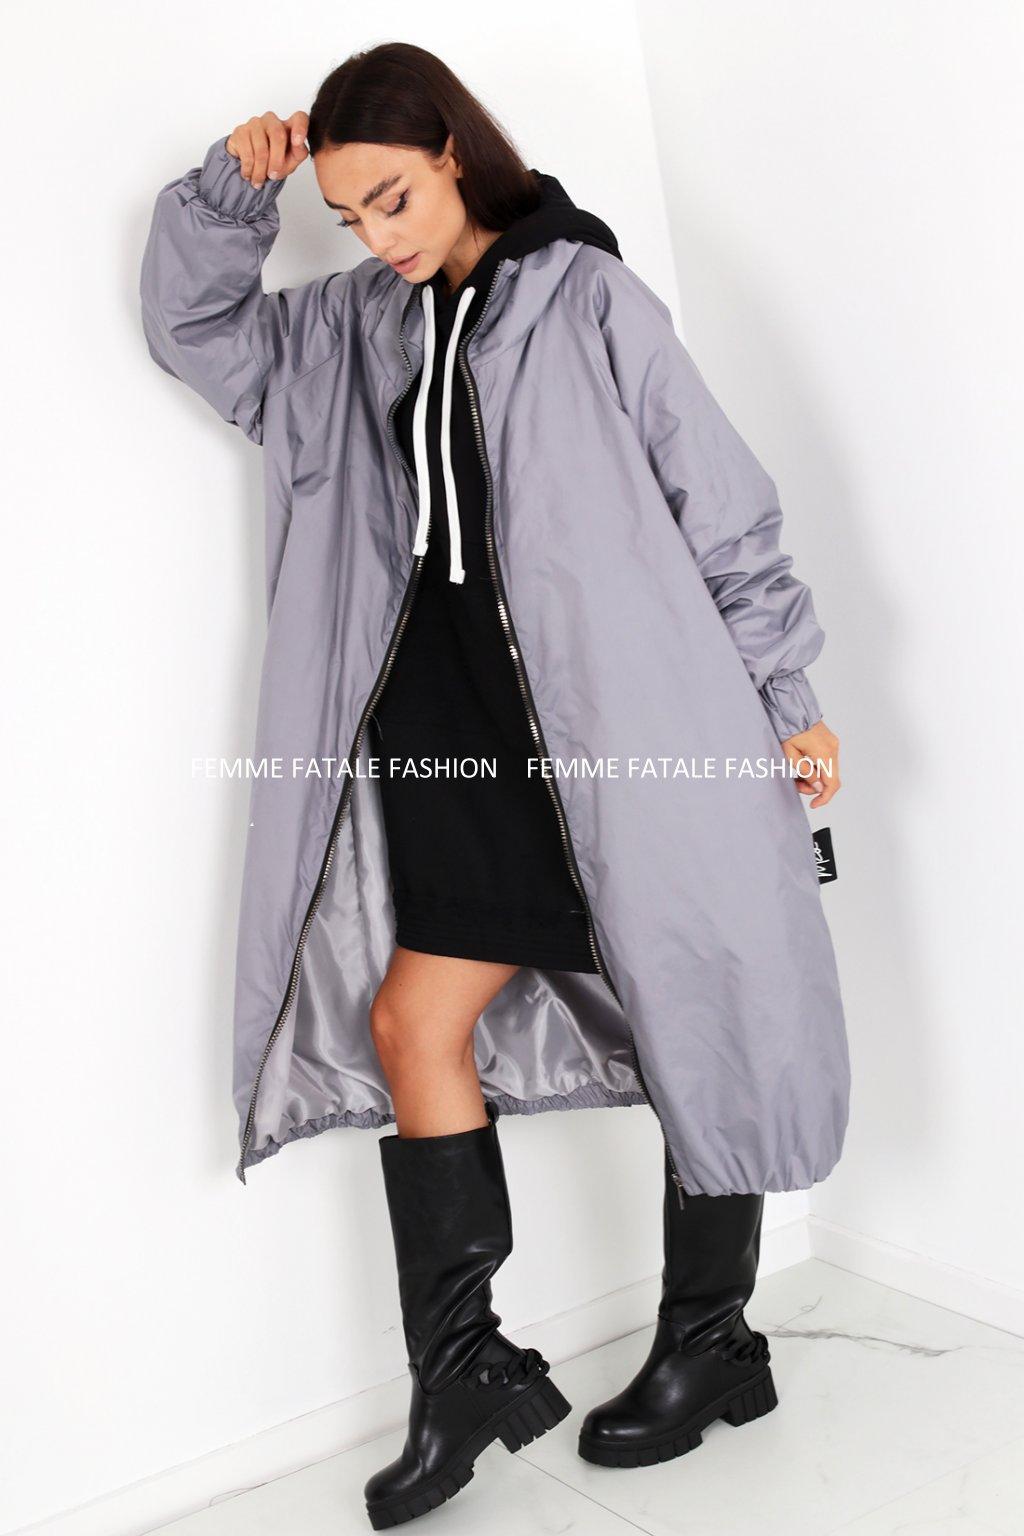 Dámský podzimní kabát EARTH femmefatalefashion (1)